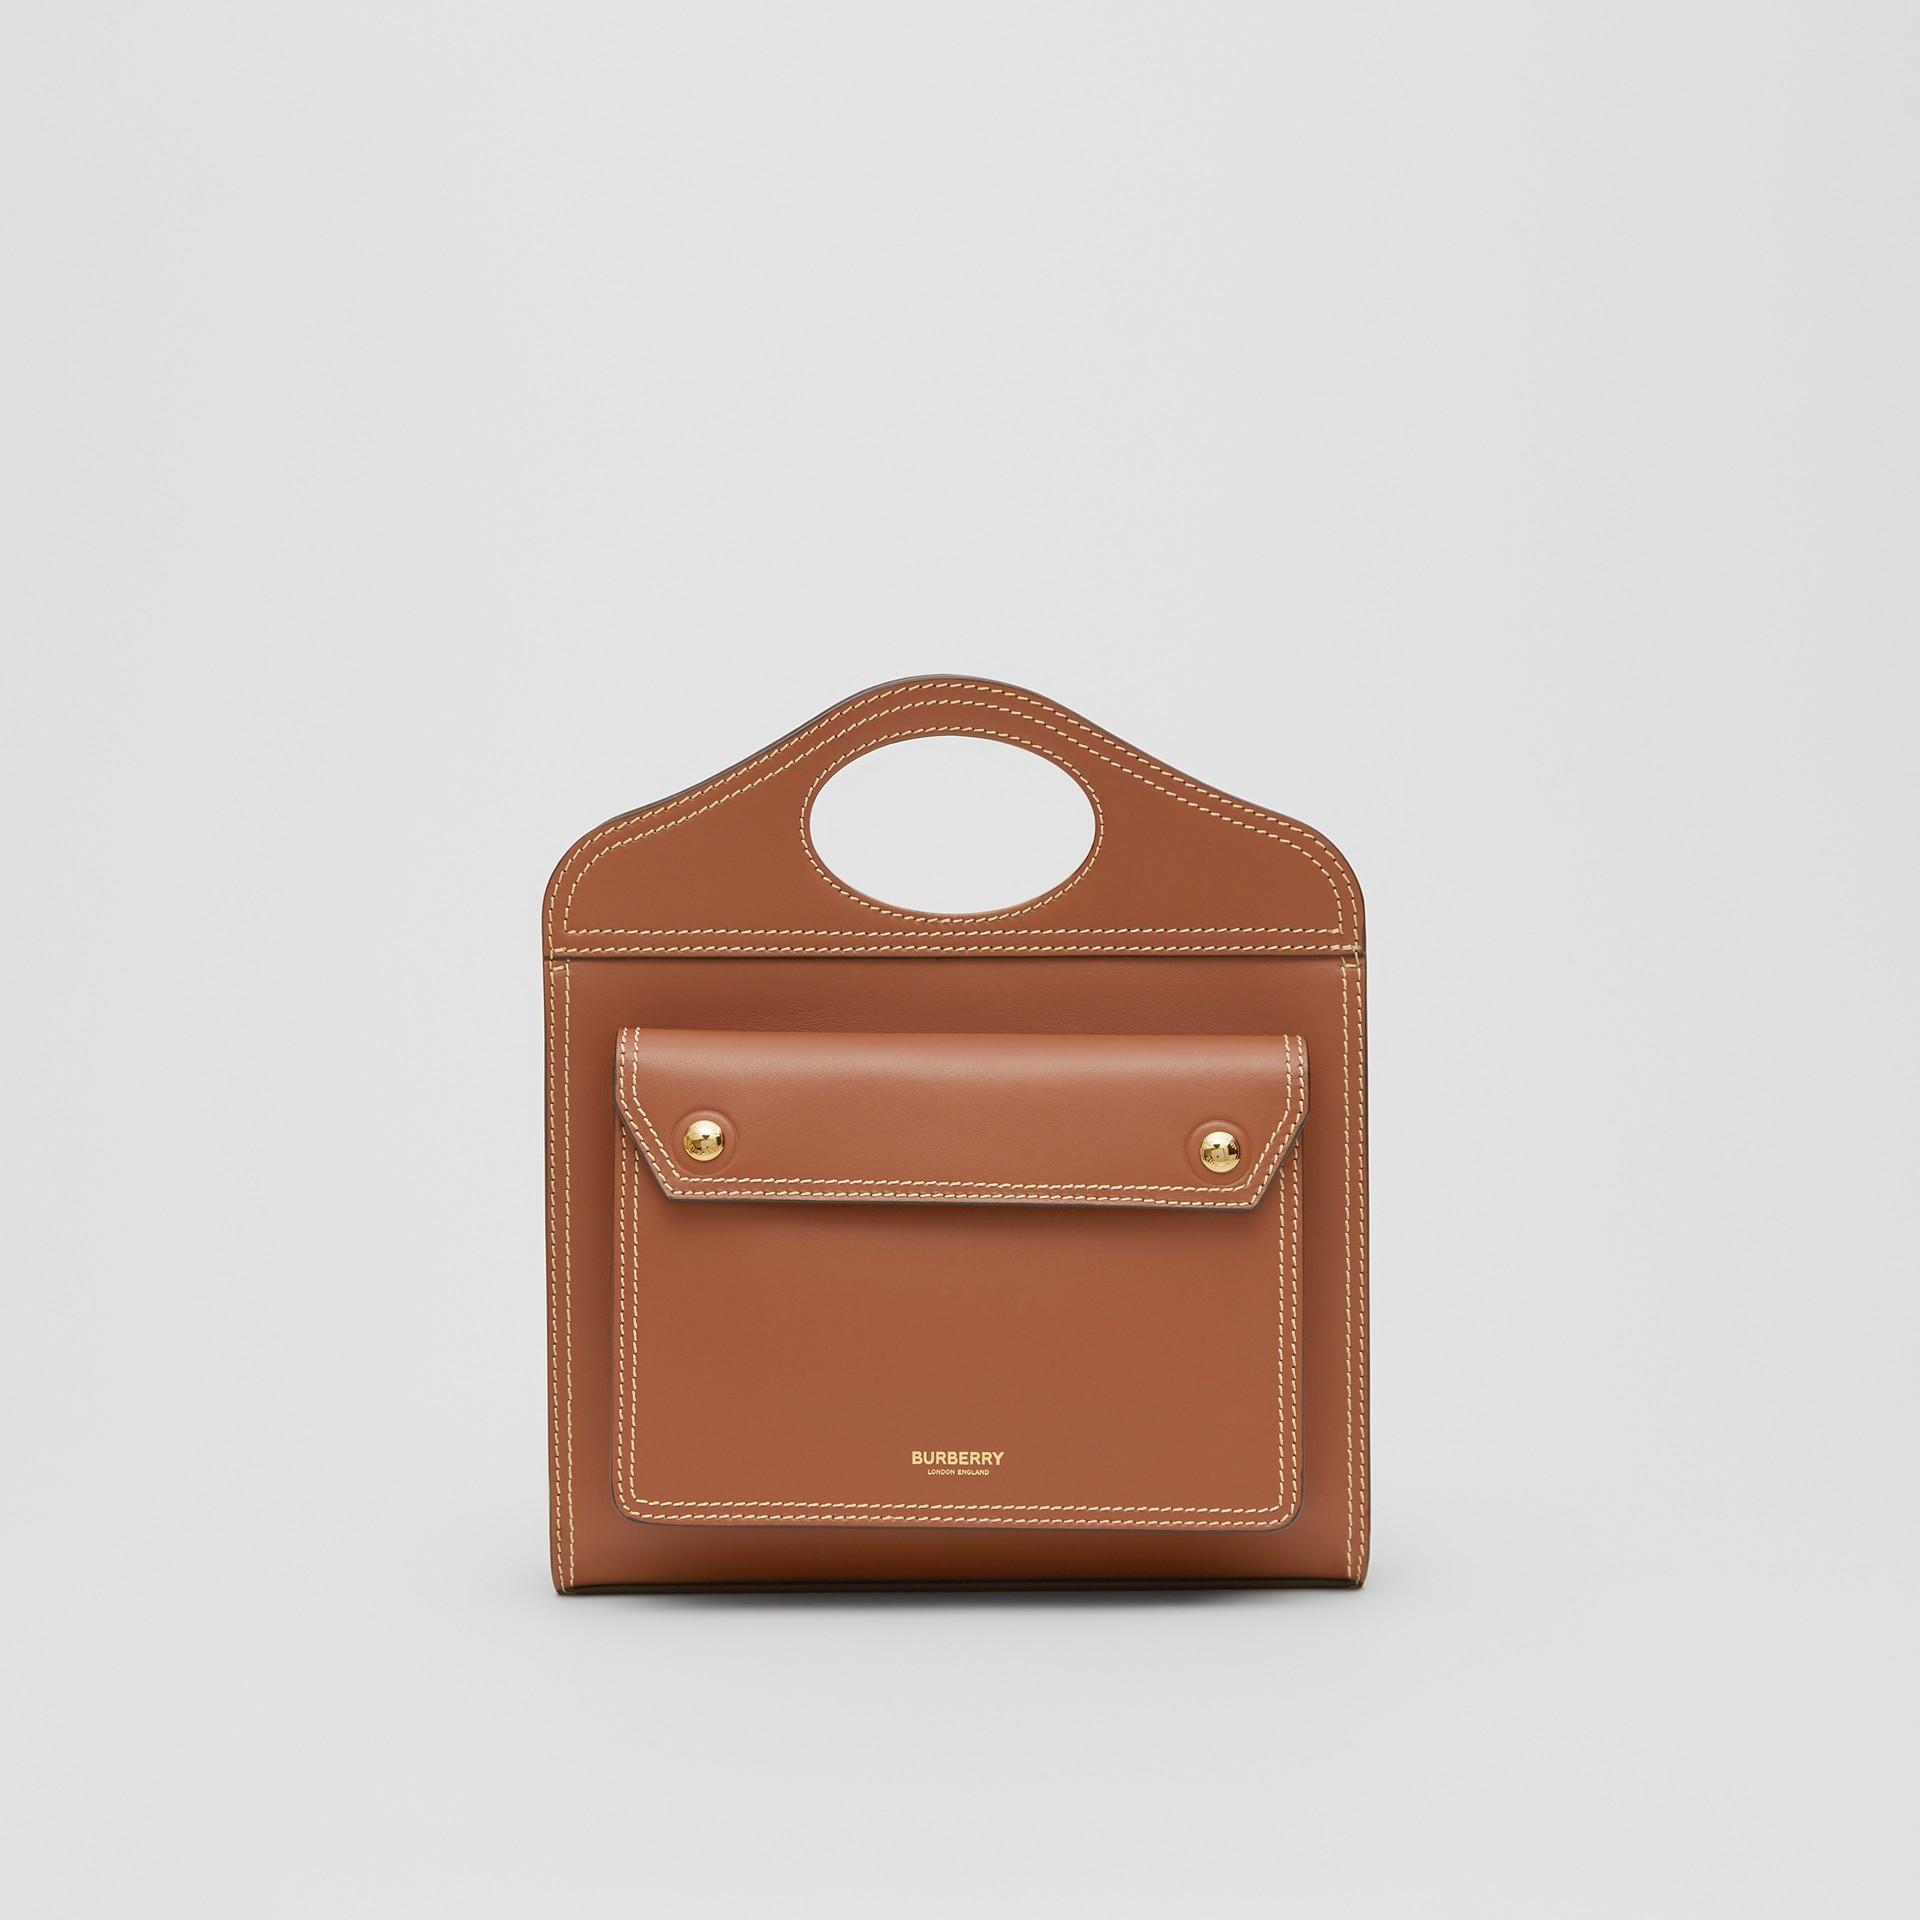 Pocket Bag im Miniformat aus Leder mit Steppnahtdetails (Malzbraun) - Damen | Burberry - Galerie-Bild 0